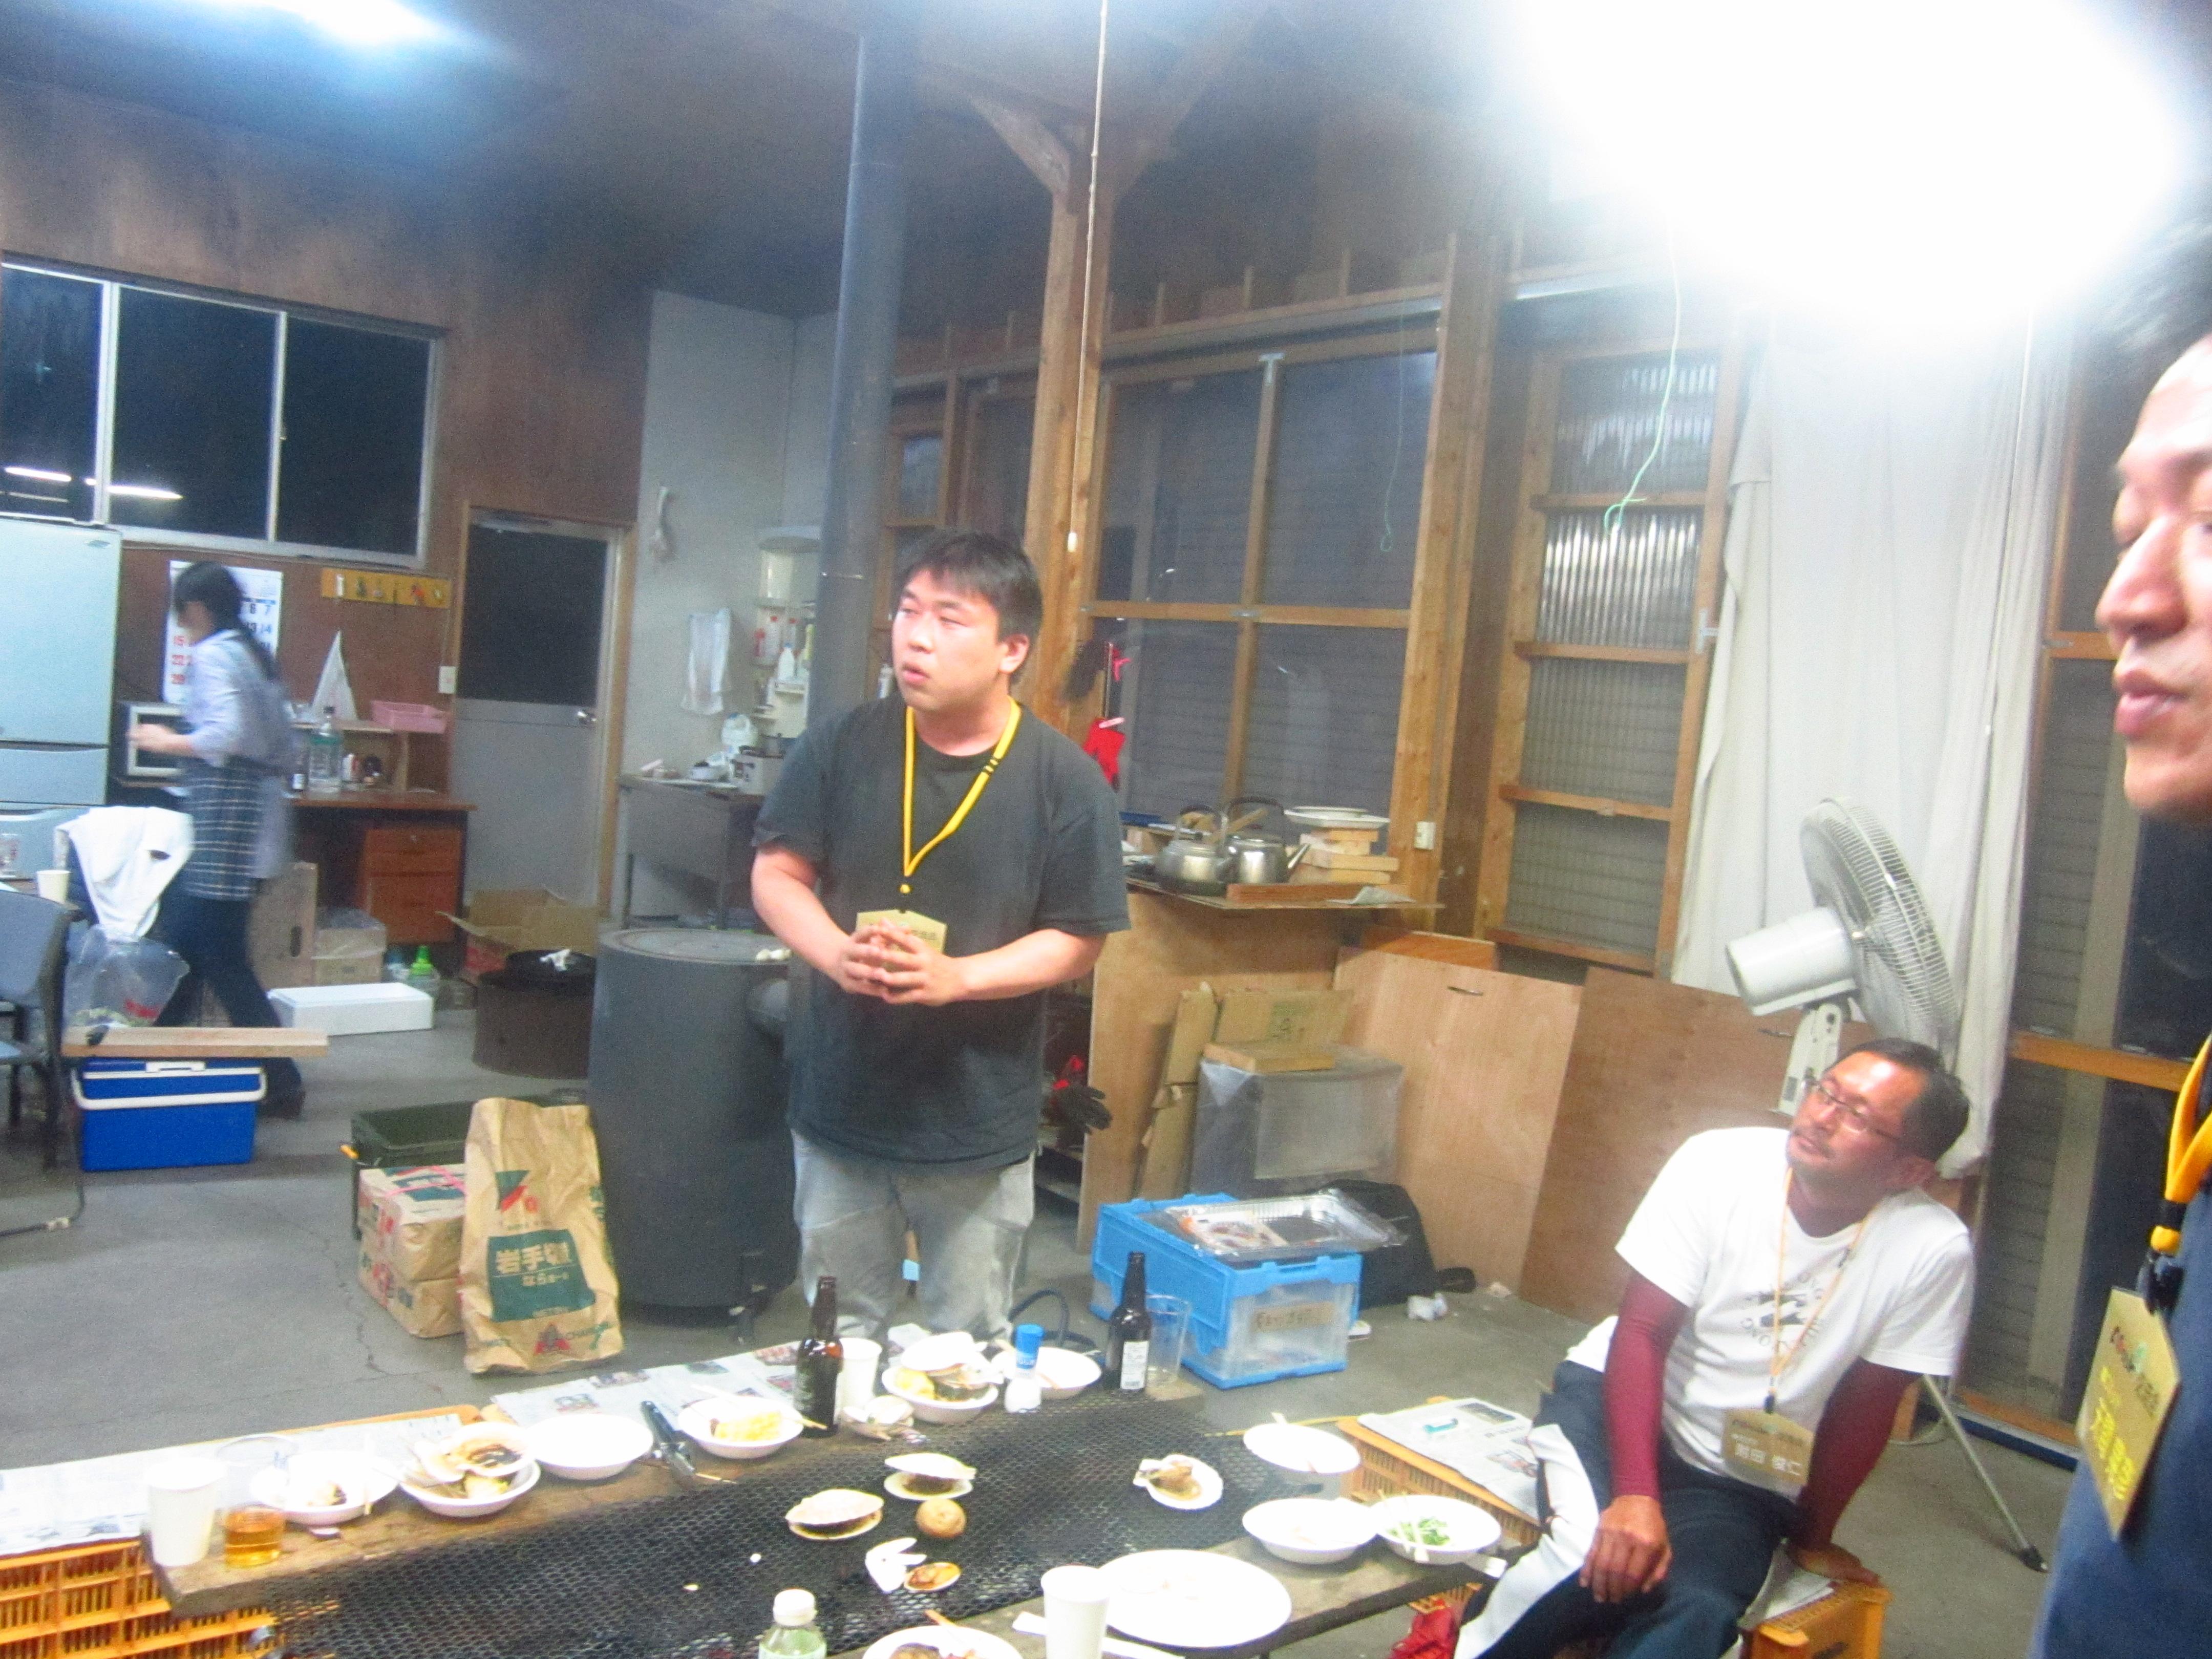 IMG 4371 - 麻布十番納涼祭り25,26日(七戸町出店)